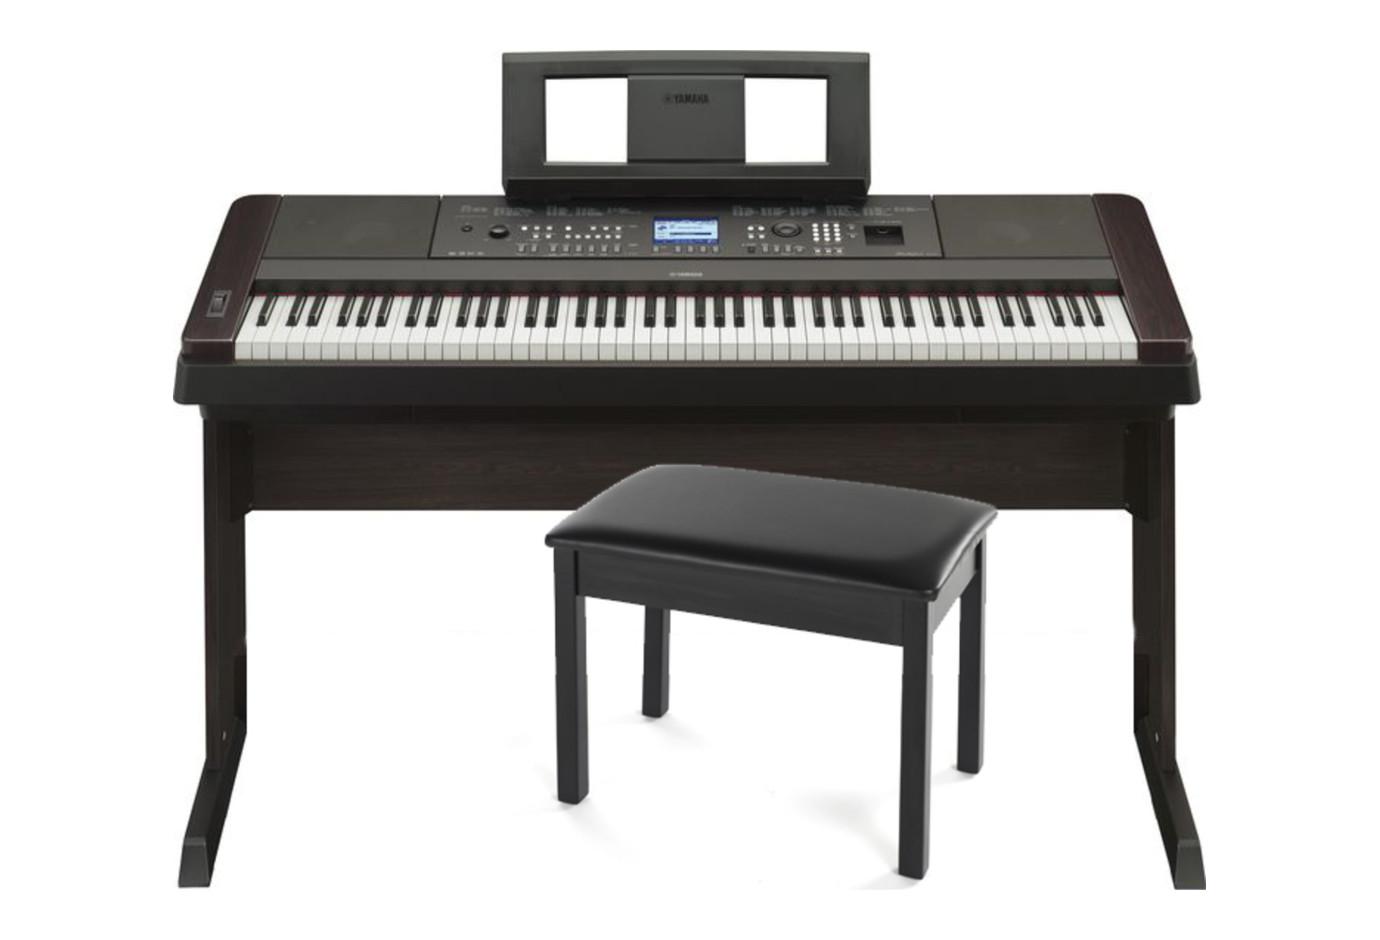 Yamaha dgx 650 88 key digital piano bundle for Yamaha full size keyboard with 88 keys